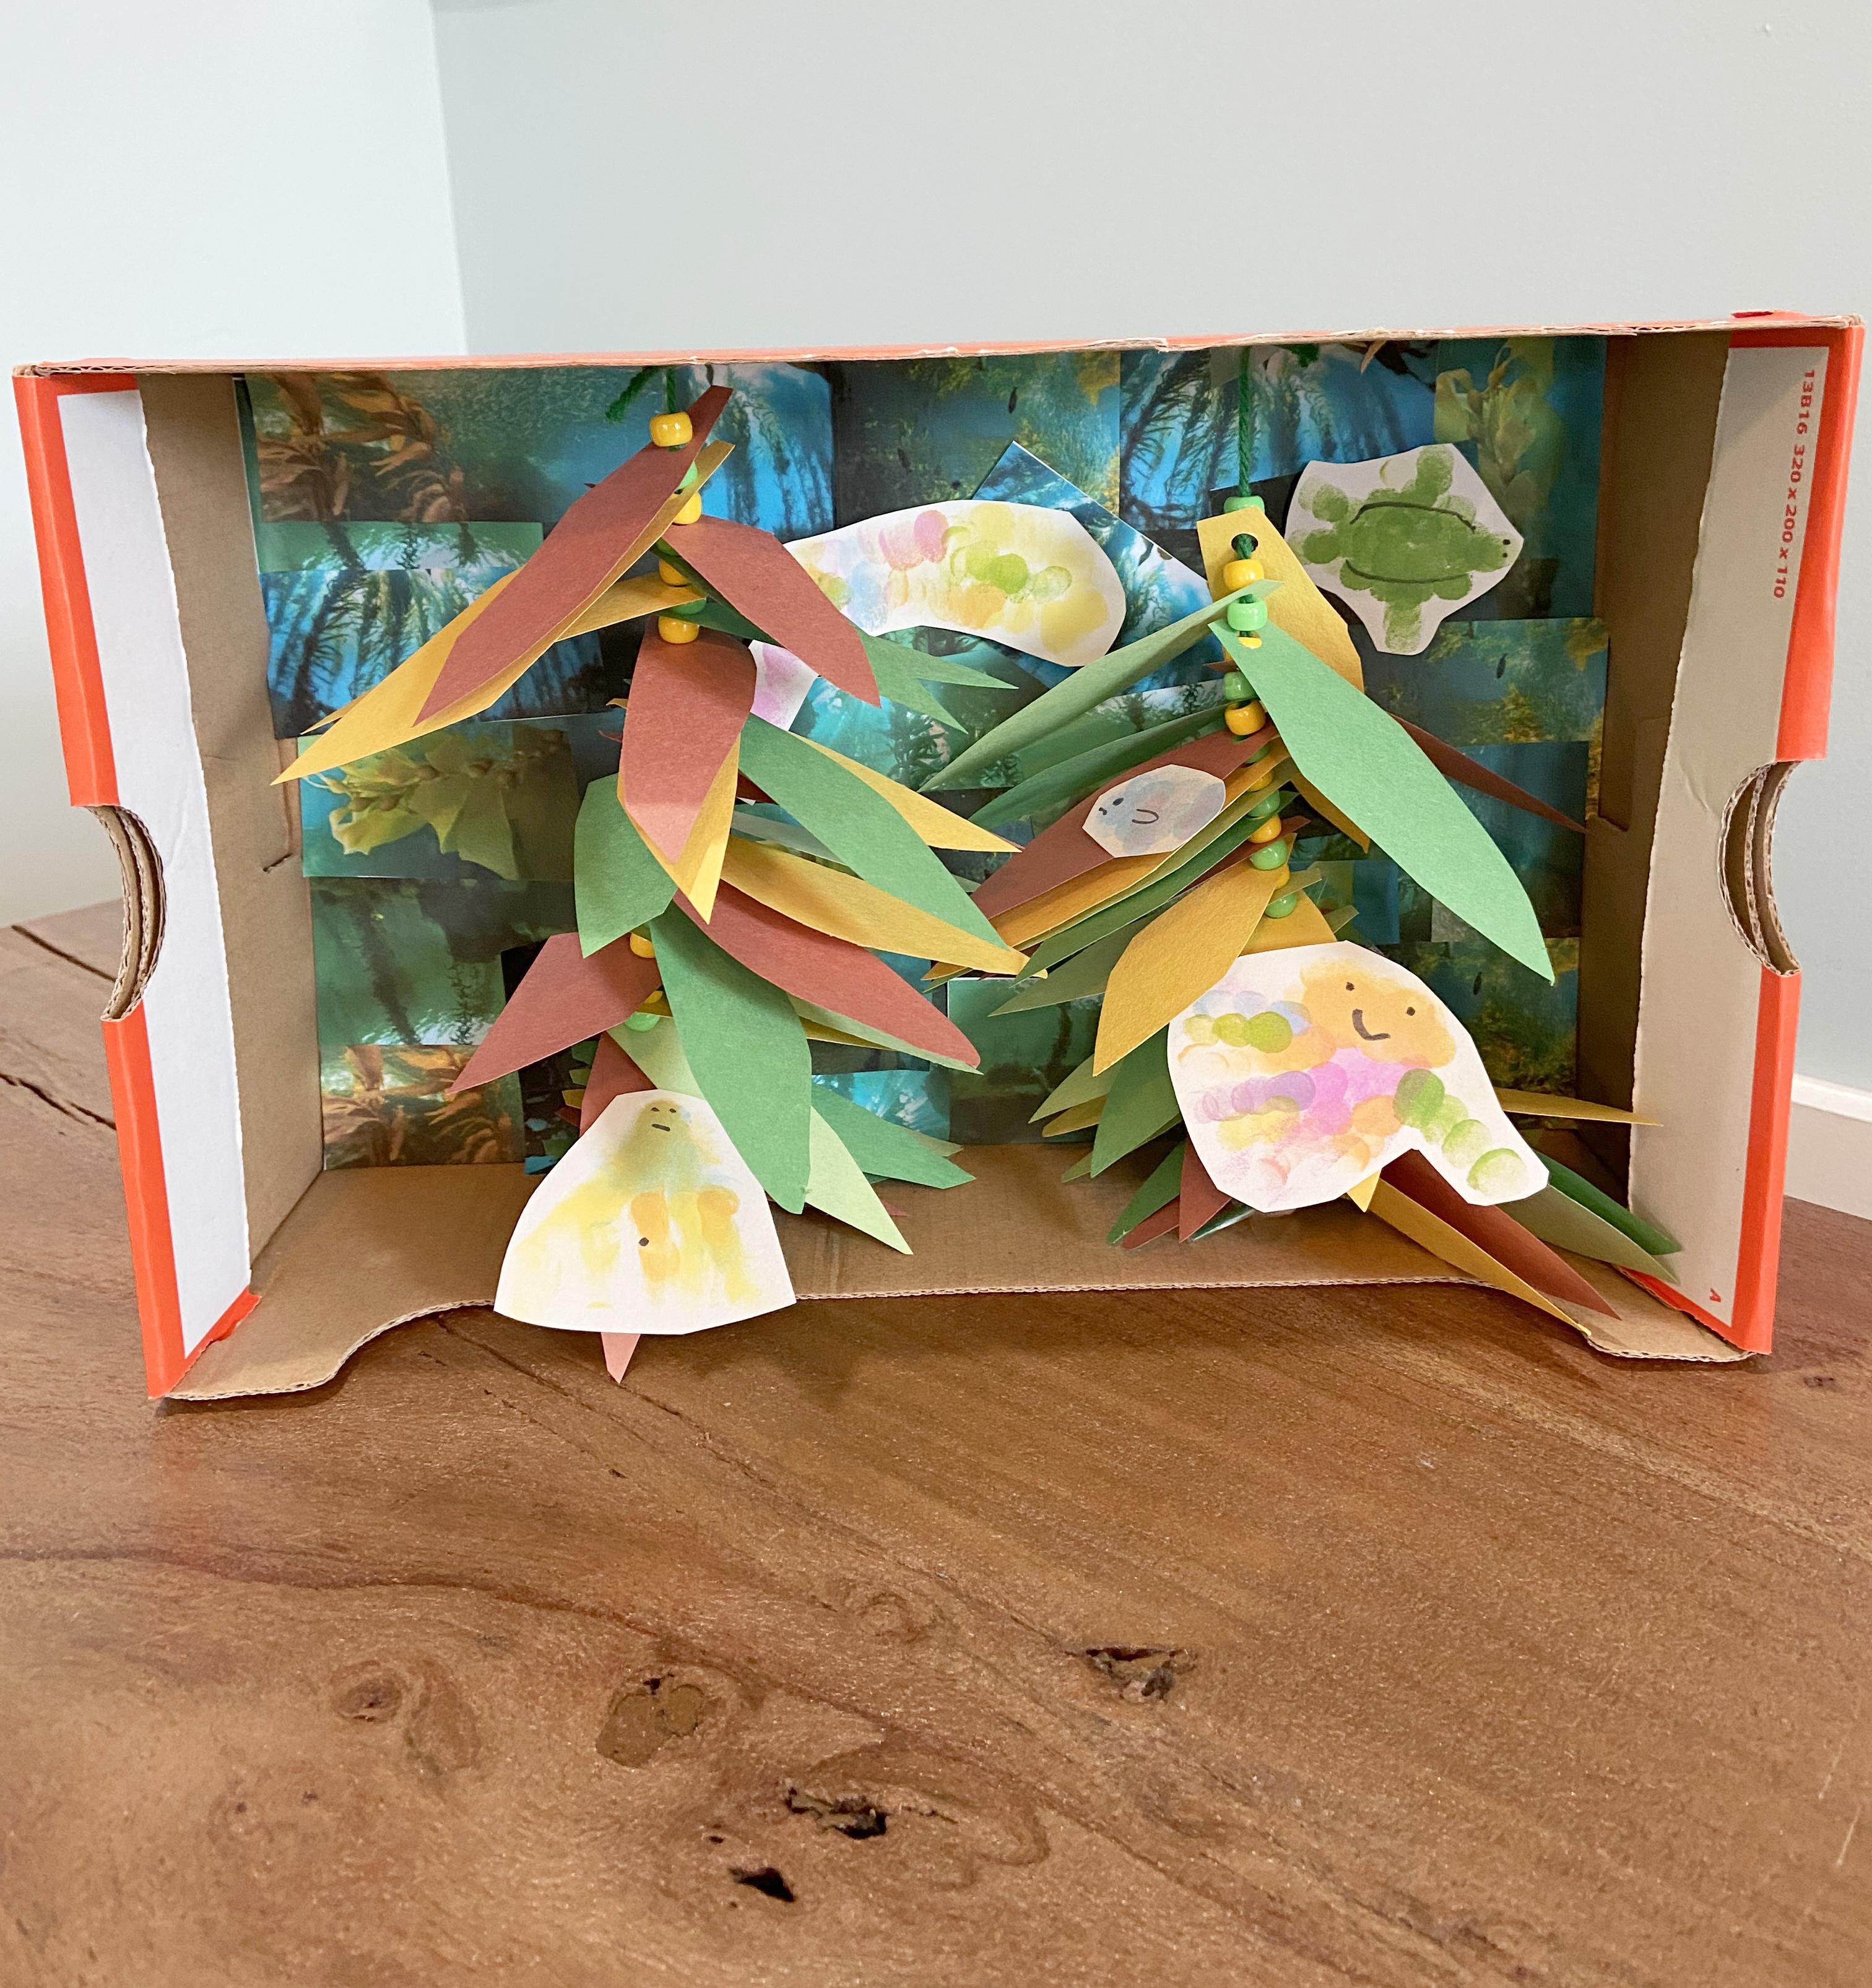 Kelp forest craft for kids - complete